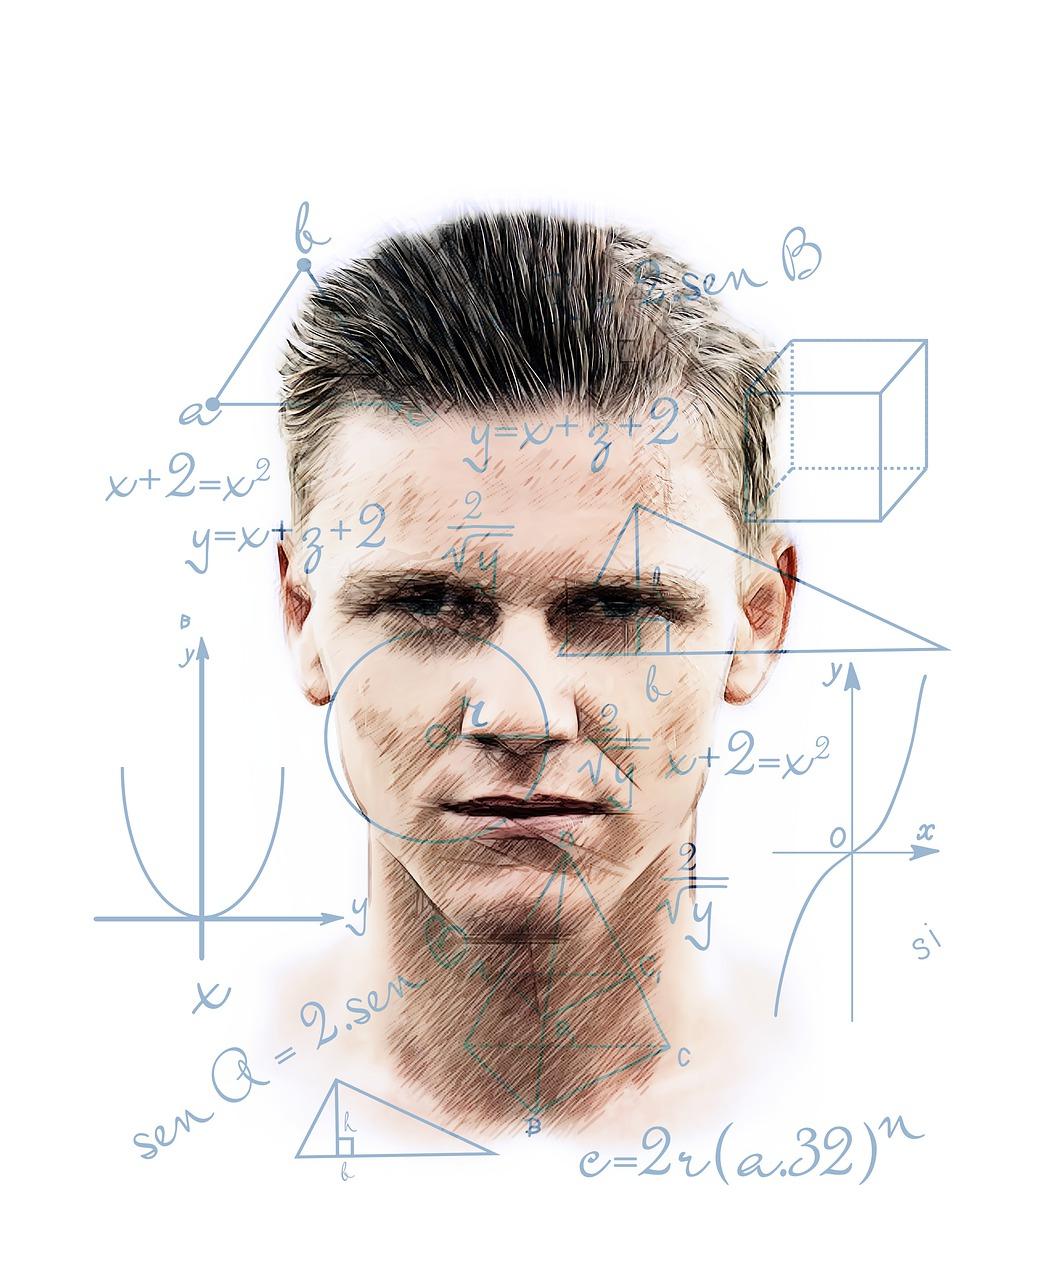 281 man is an intellectual 4776003 1280